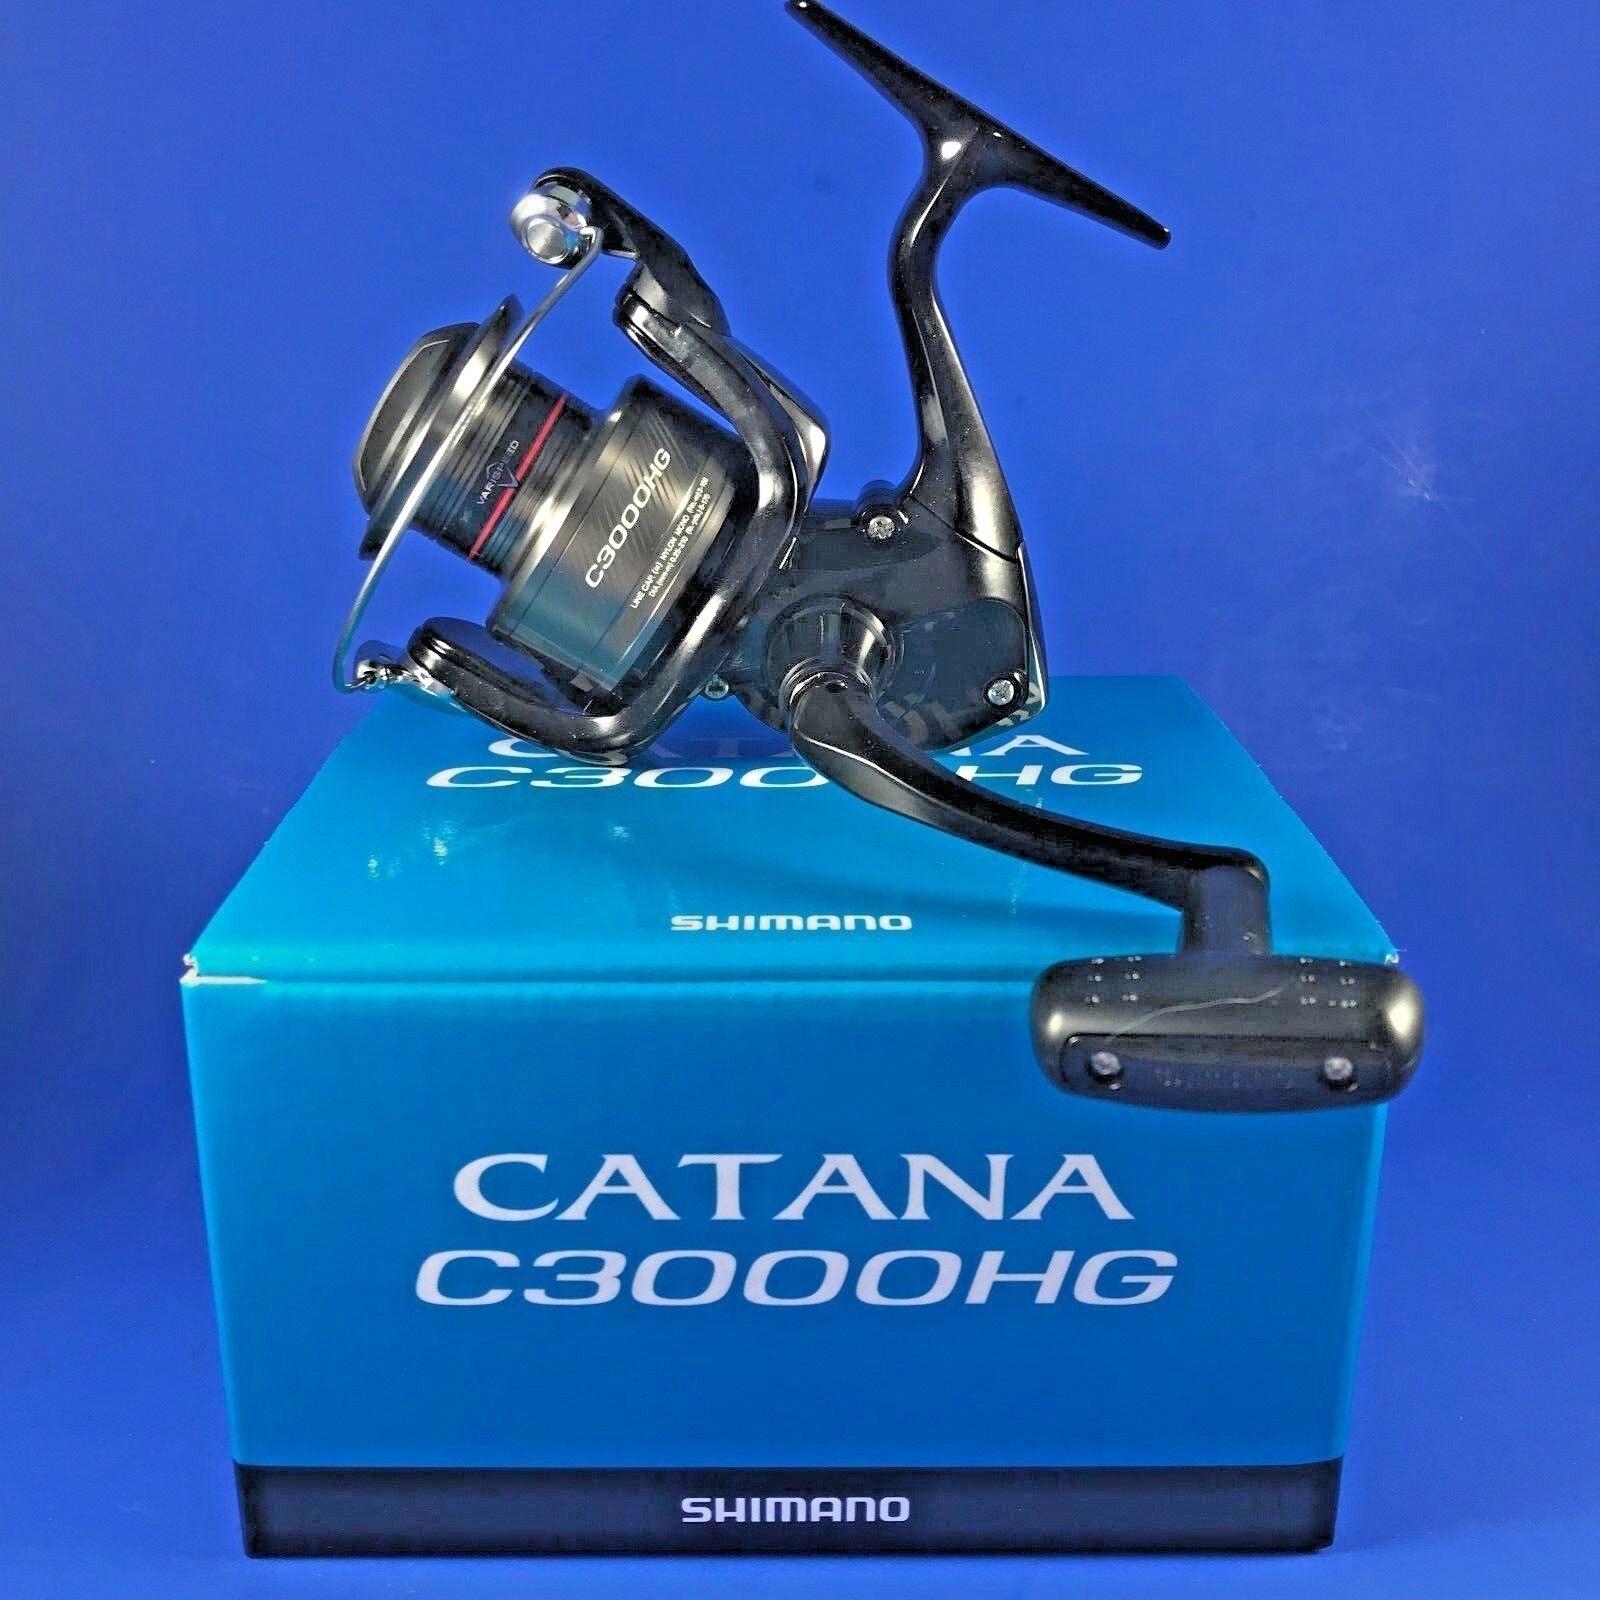 Shimano Catana C3000HG FD    CATC3000HGFD    Front Drag Fishing Reel